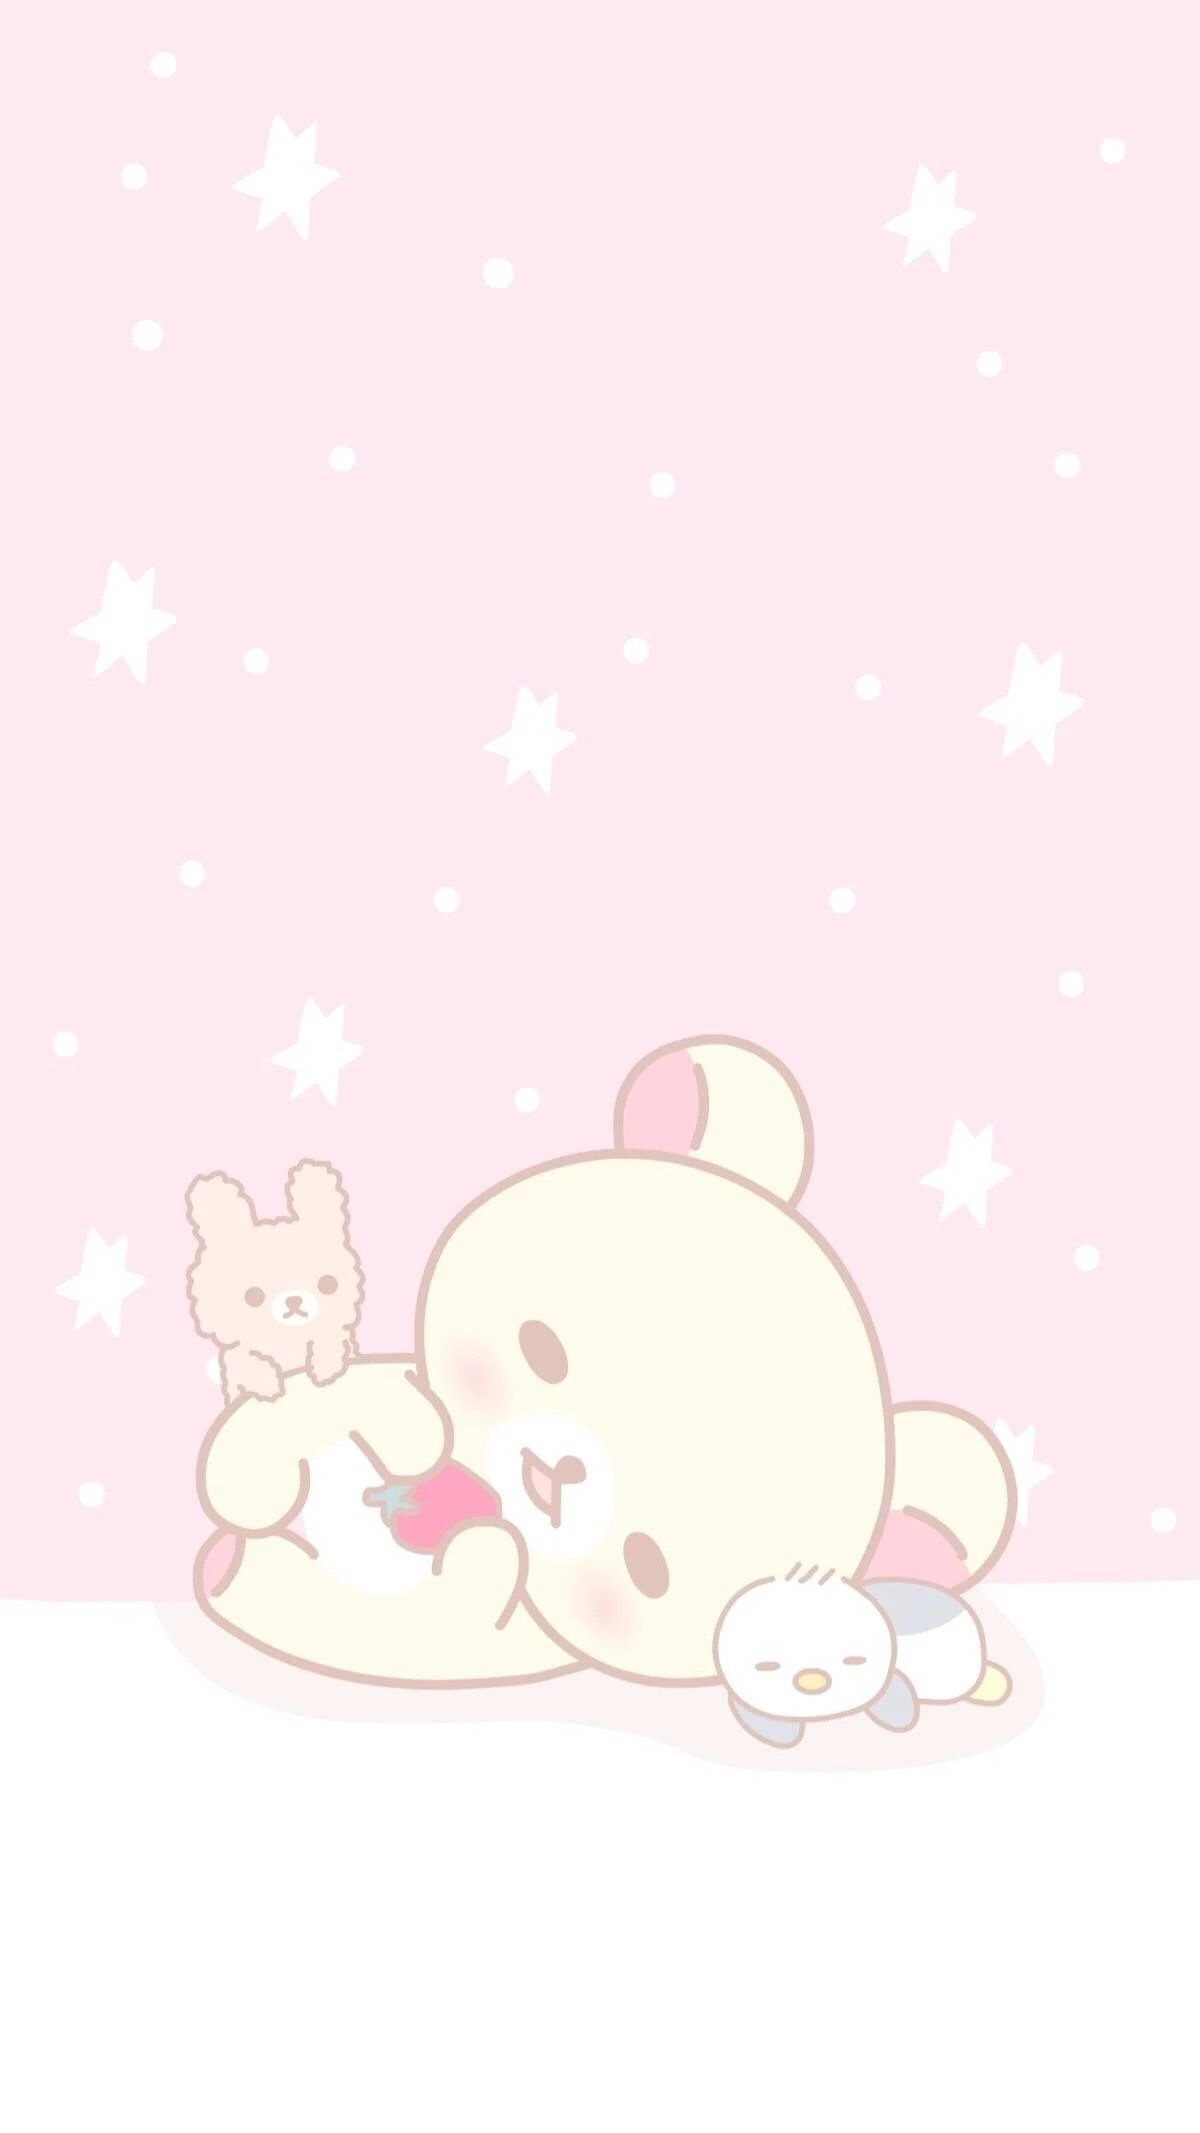 Kawaii Pastel Aesthetic Pink Kawaii ...